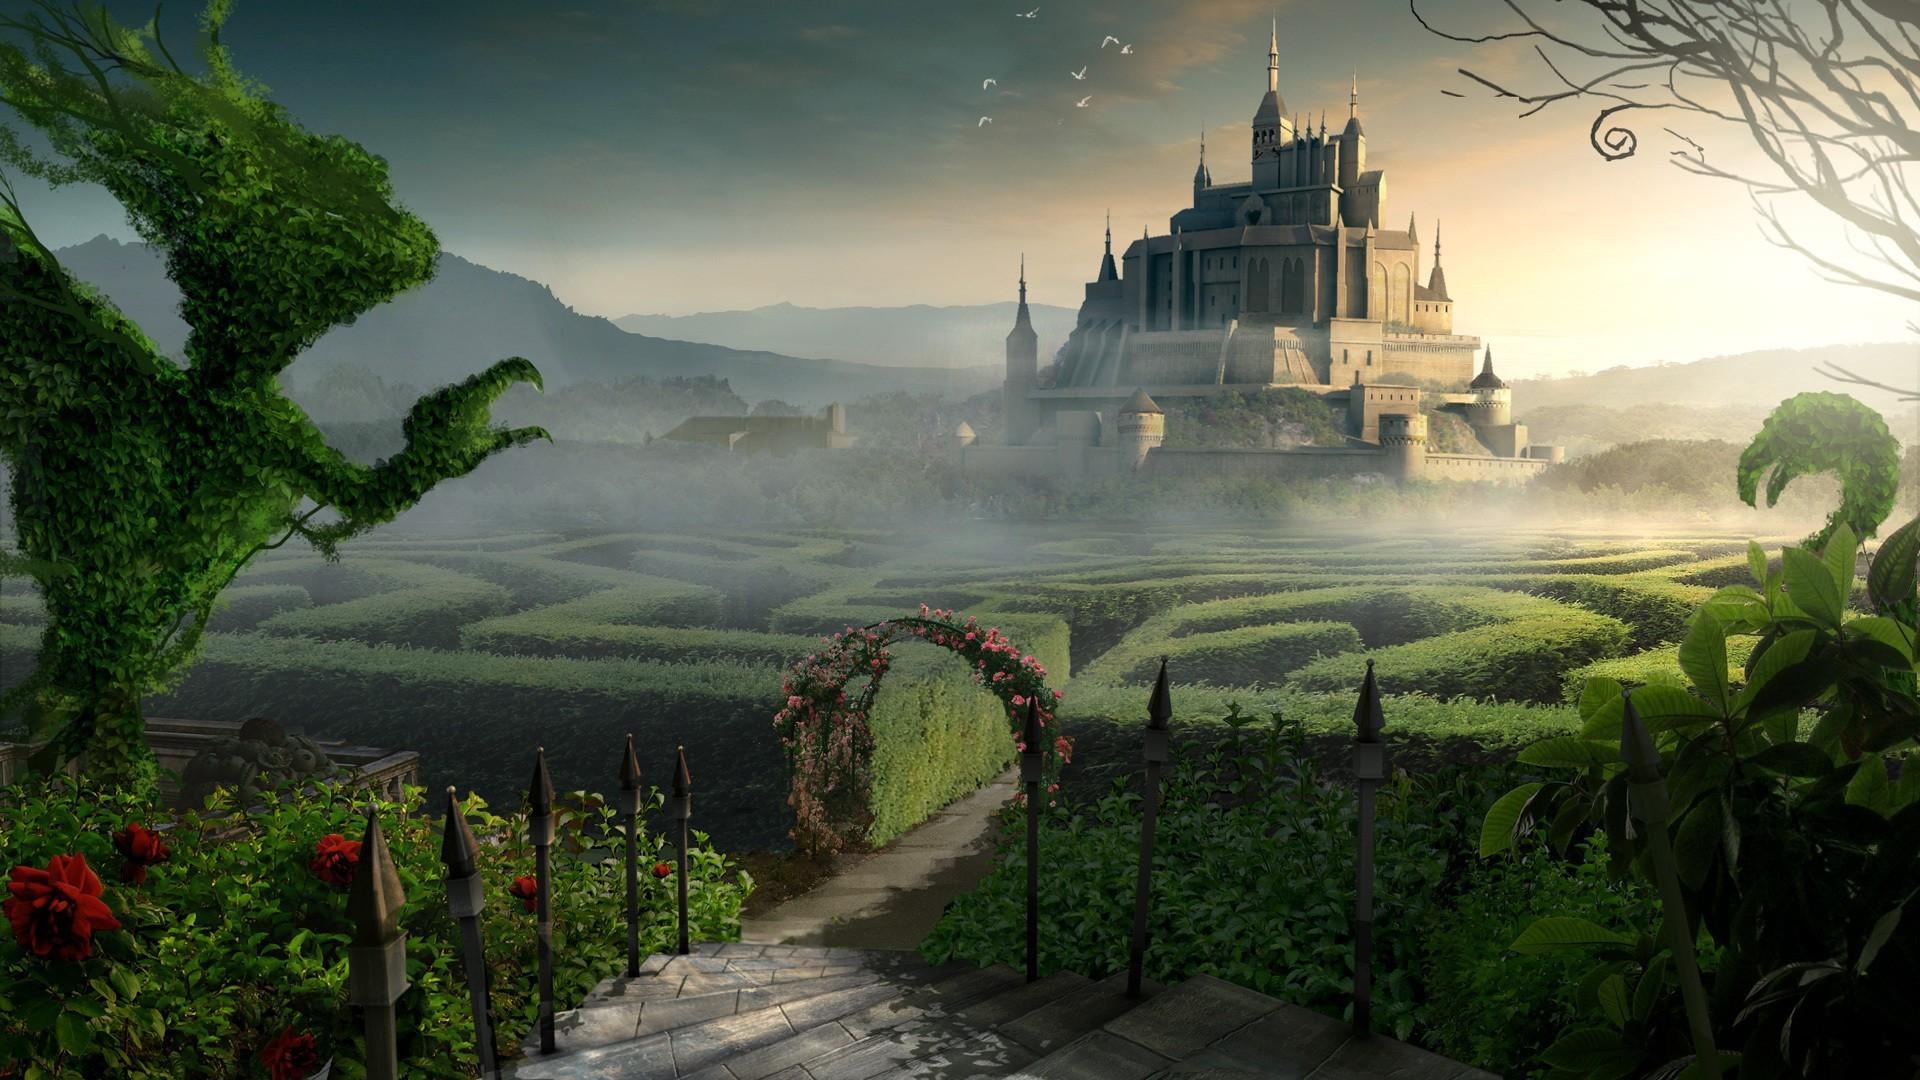 ZO161 Fantasy Landscape Wallpapers, Desktop-Screens.com